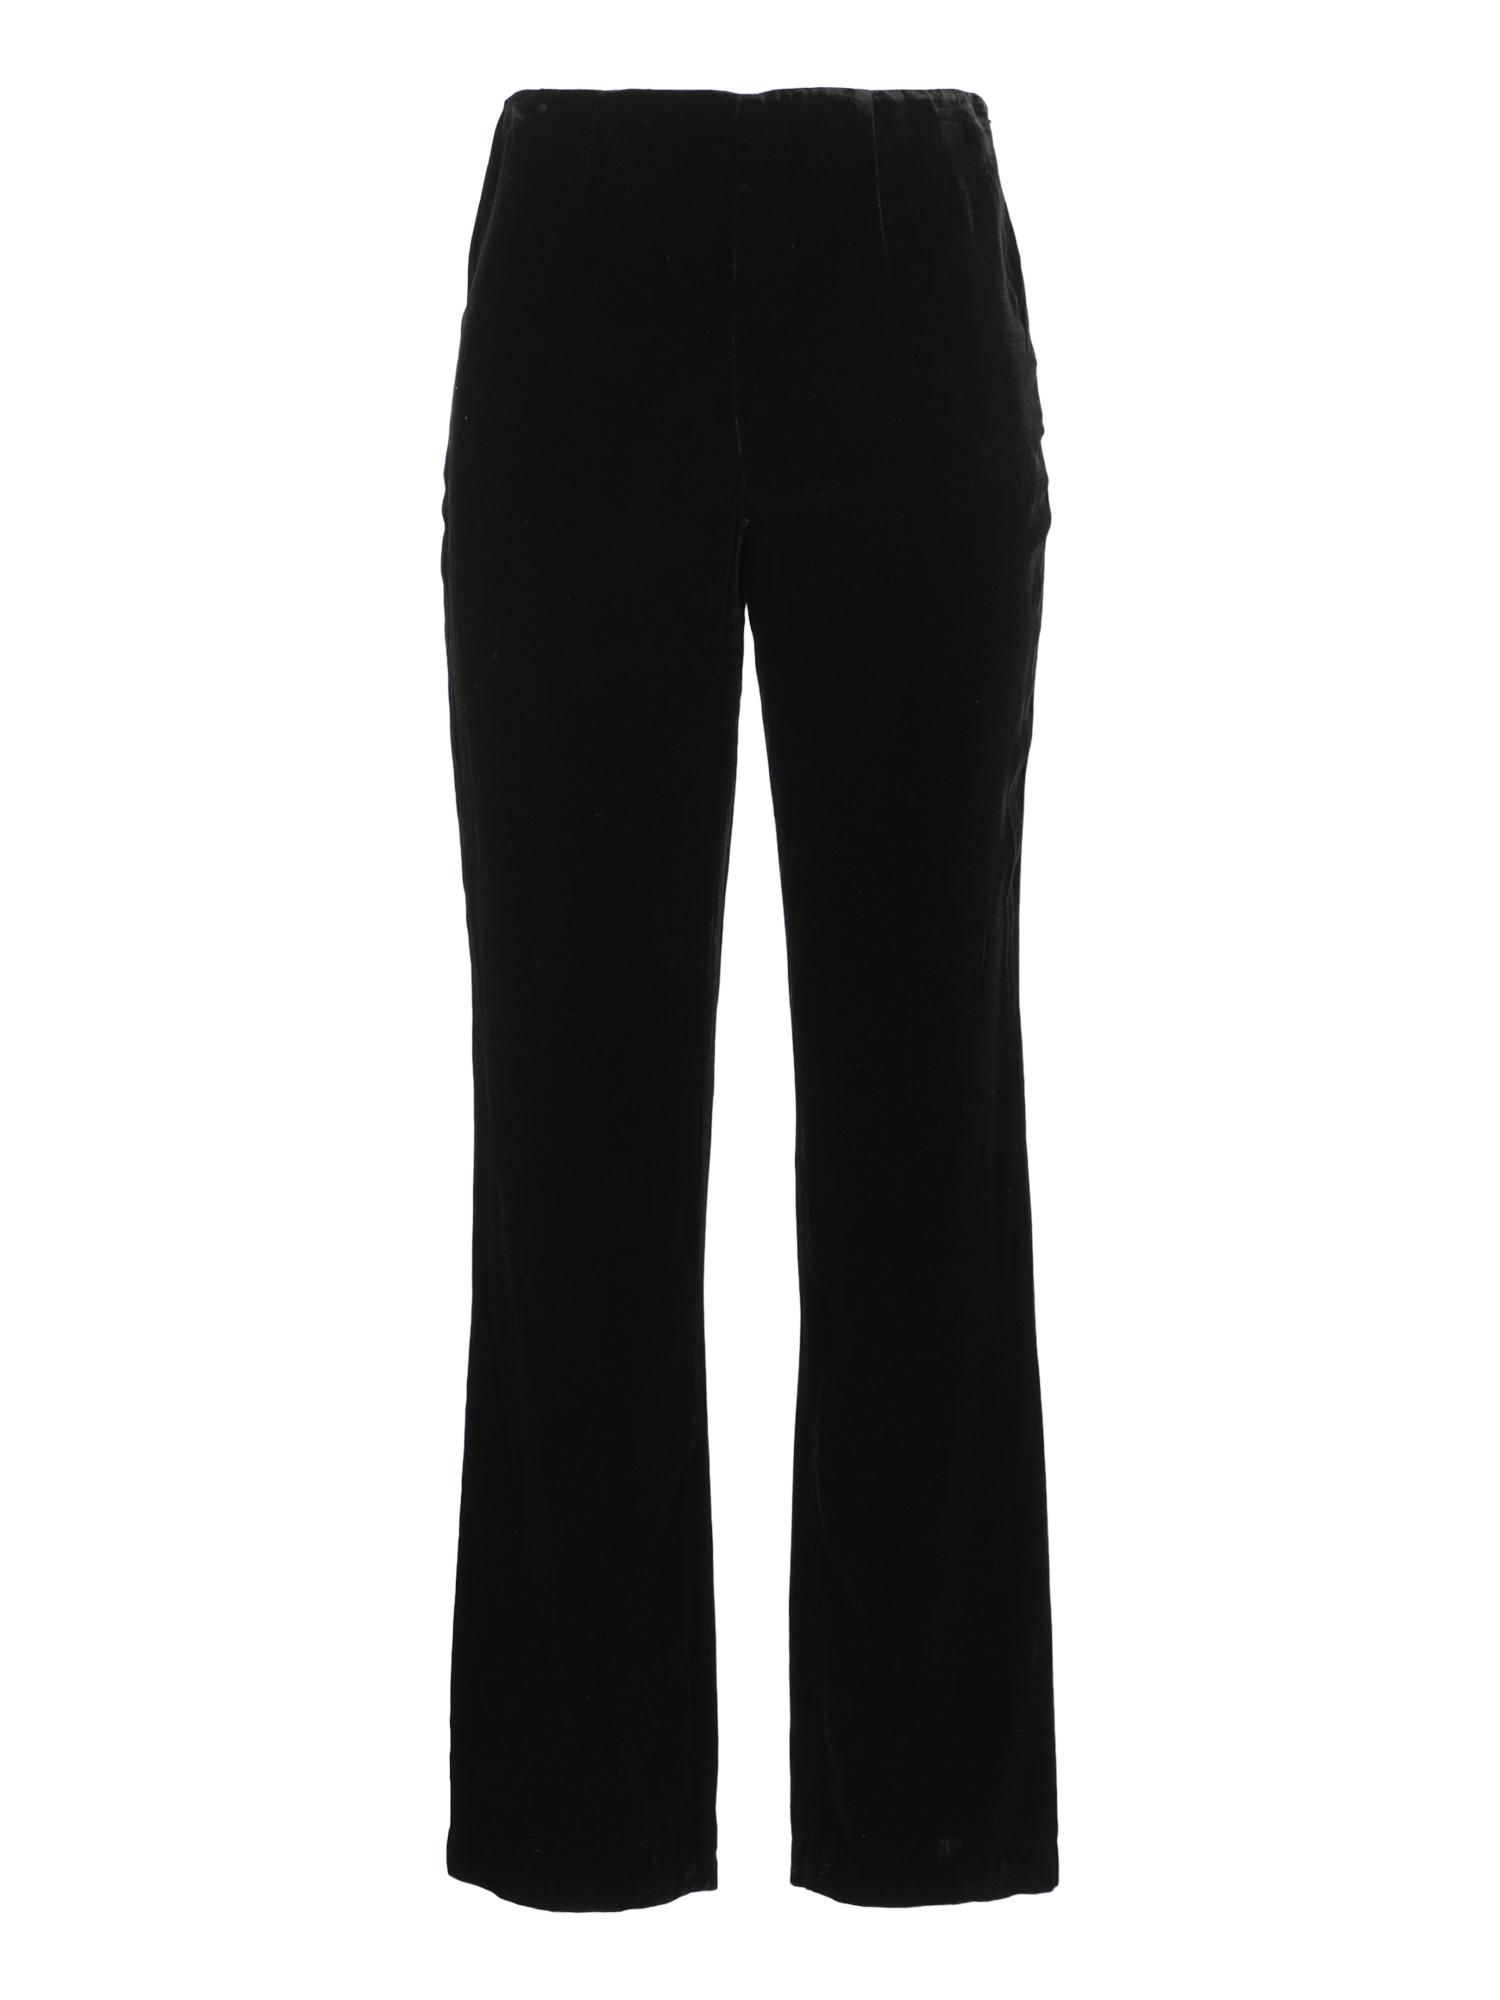 Pre-owned Ralph Lauren Clothing In Black